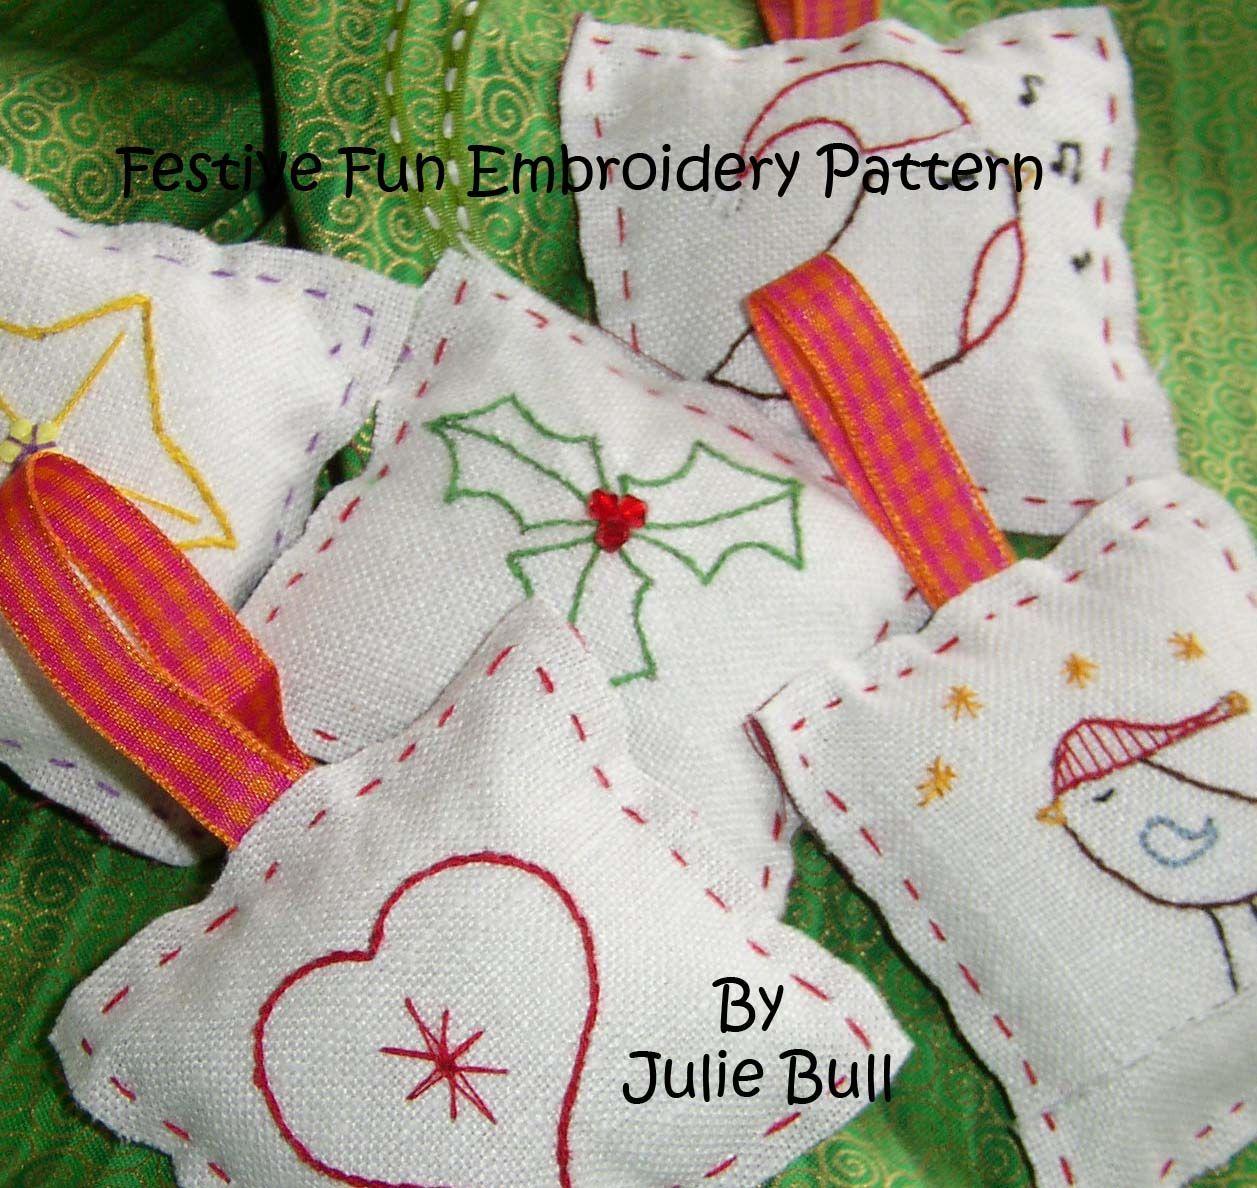 Festive Fun Hand Embroidery Pattern